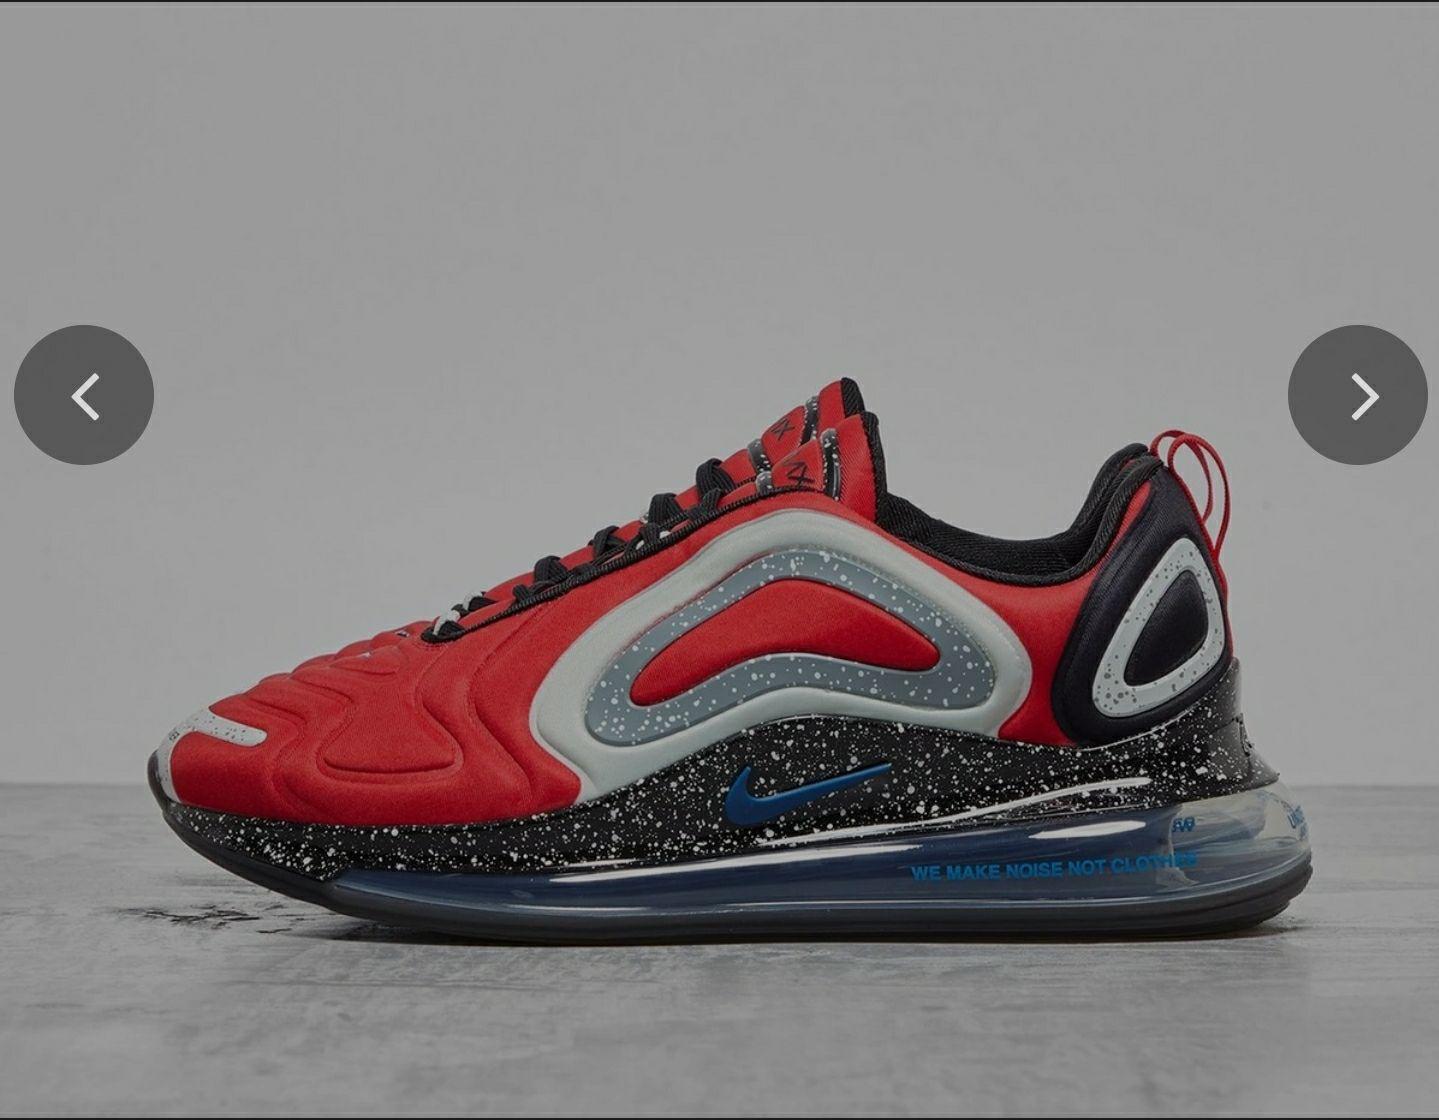 Nike x UNDERCOVER Air Max 720 £90 @ FootPatrol